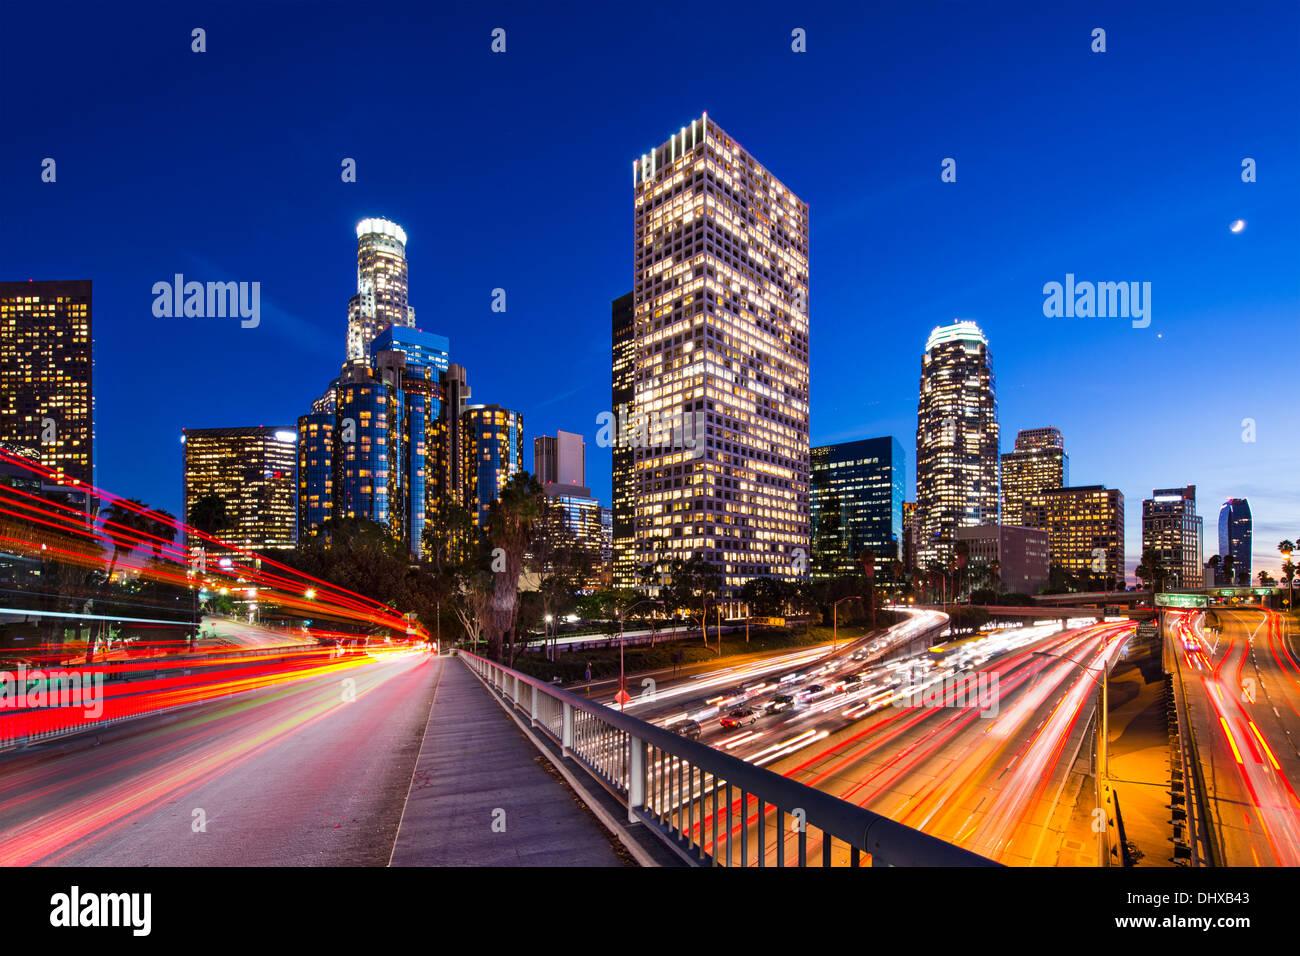 Downtown Los Angeles, California, USA skyline. - Stock Image